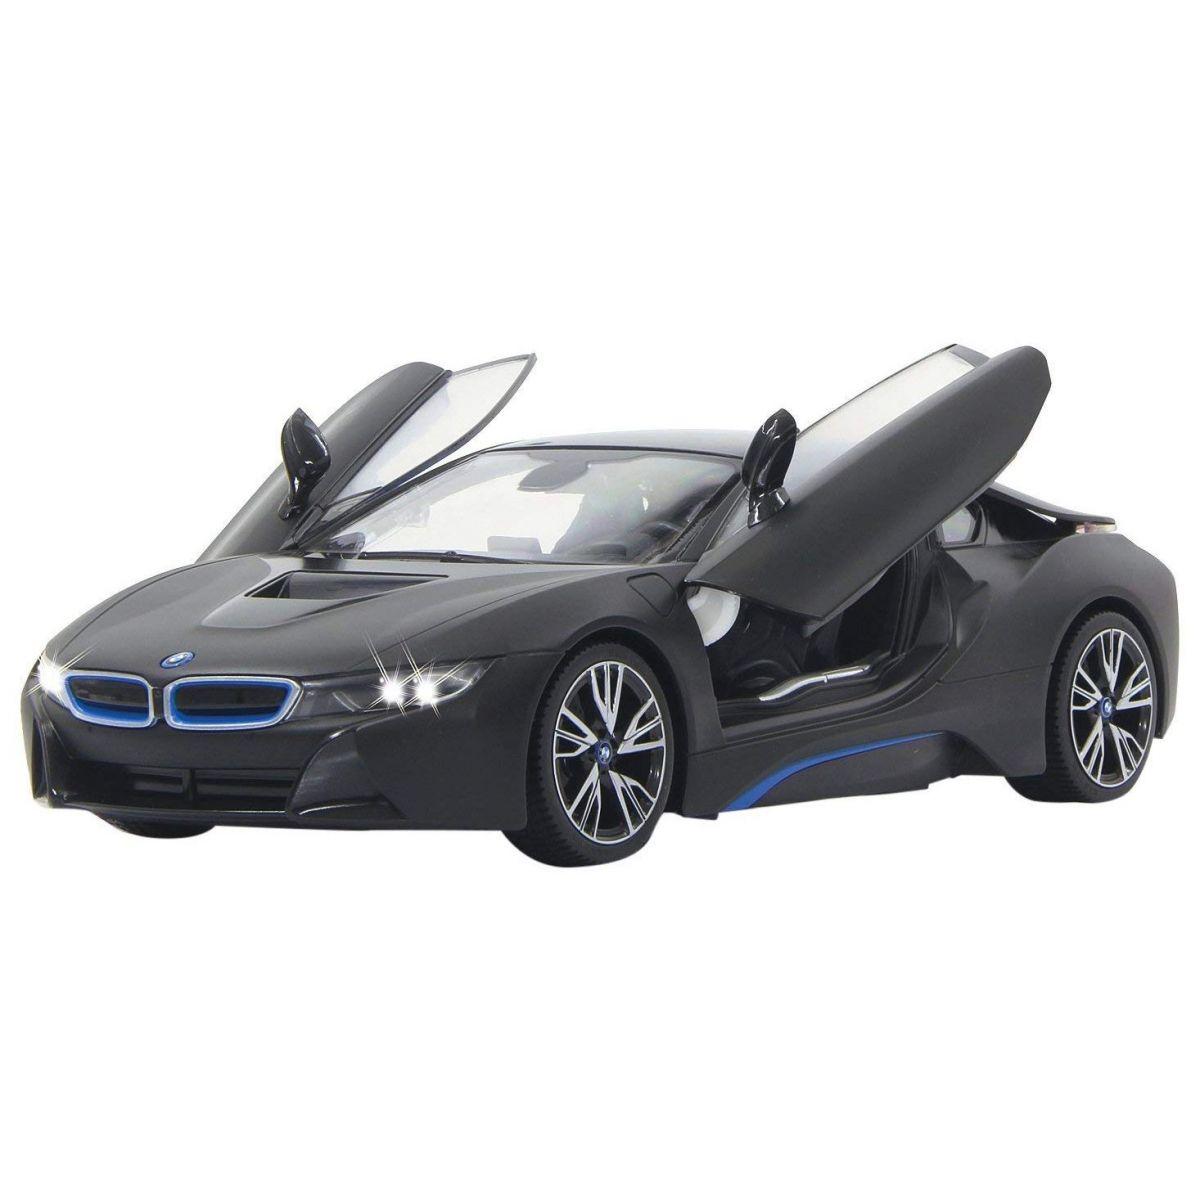 Jamara RC Auto BMW I8 RTR Se Světly Bílá 1:14